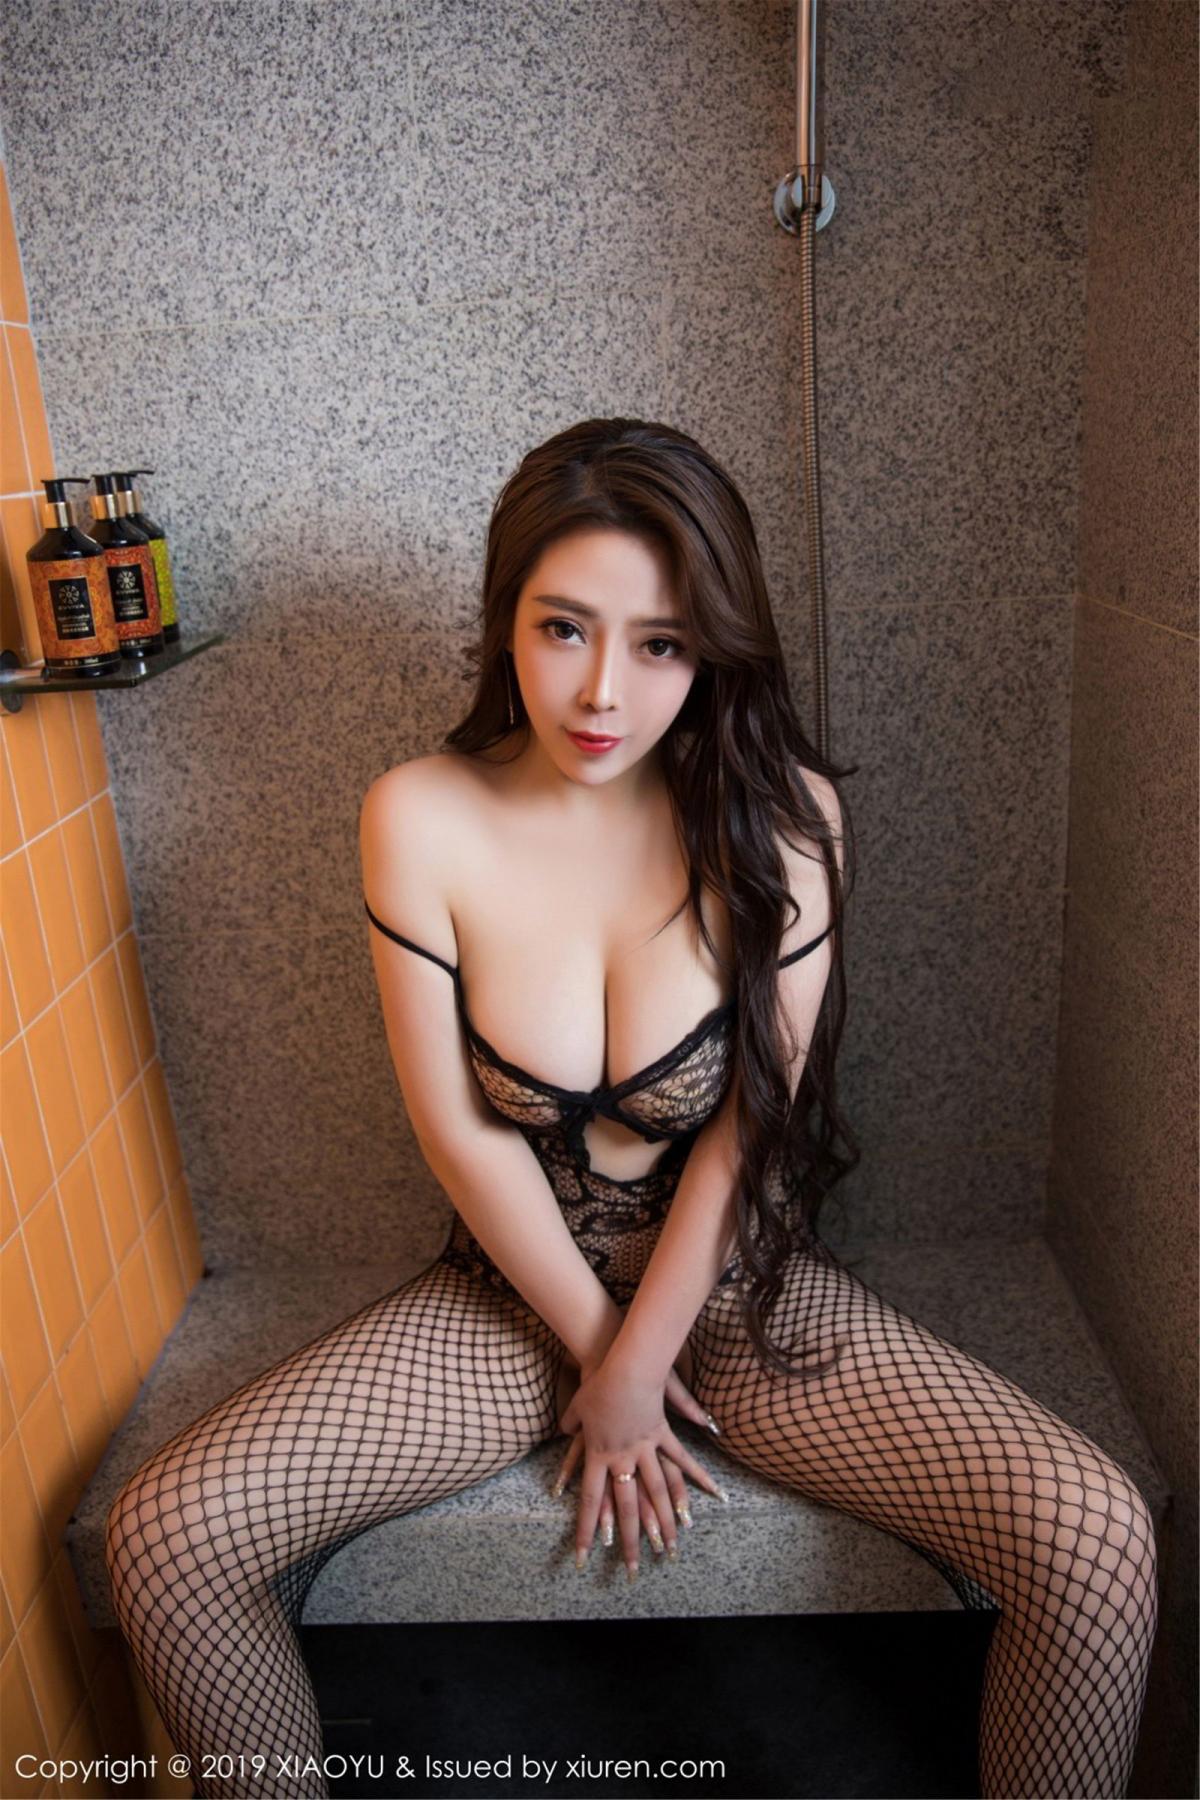 [XiaoYu] Vol.058 Miki Tu 33P, Miki Tu, XiaoYu